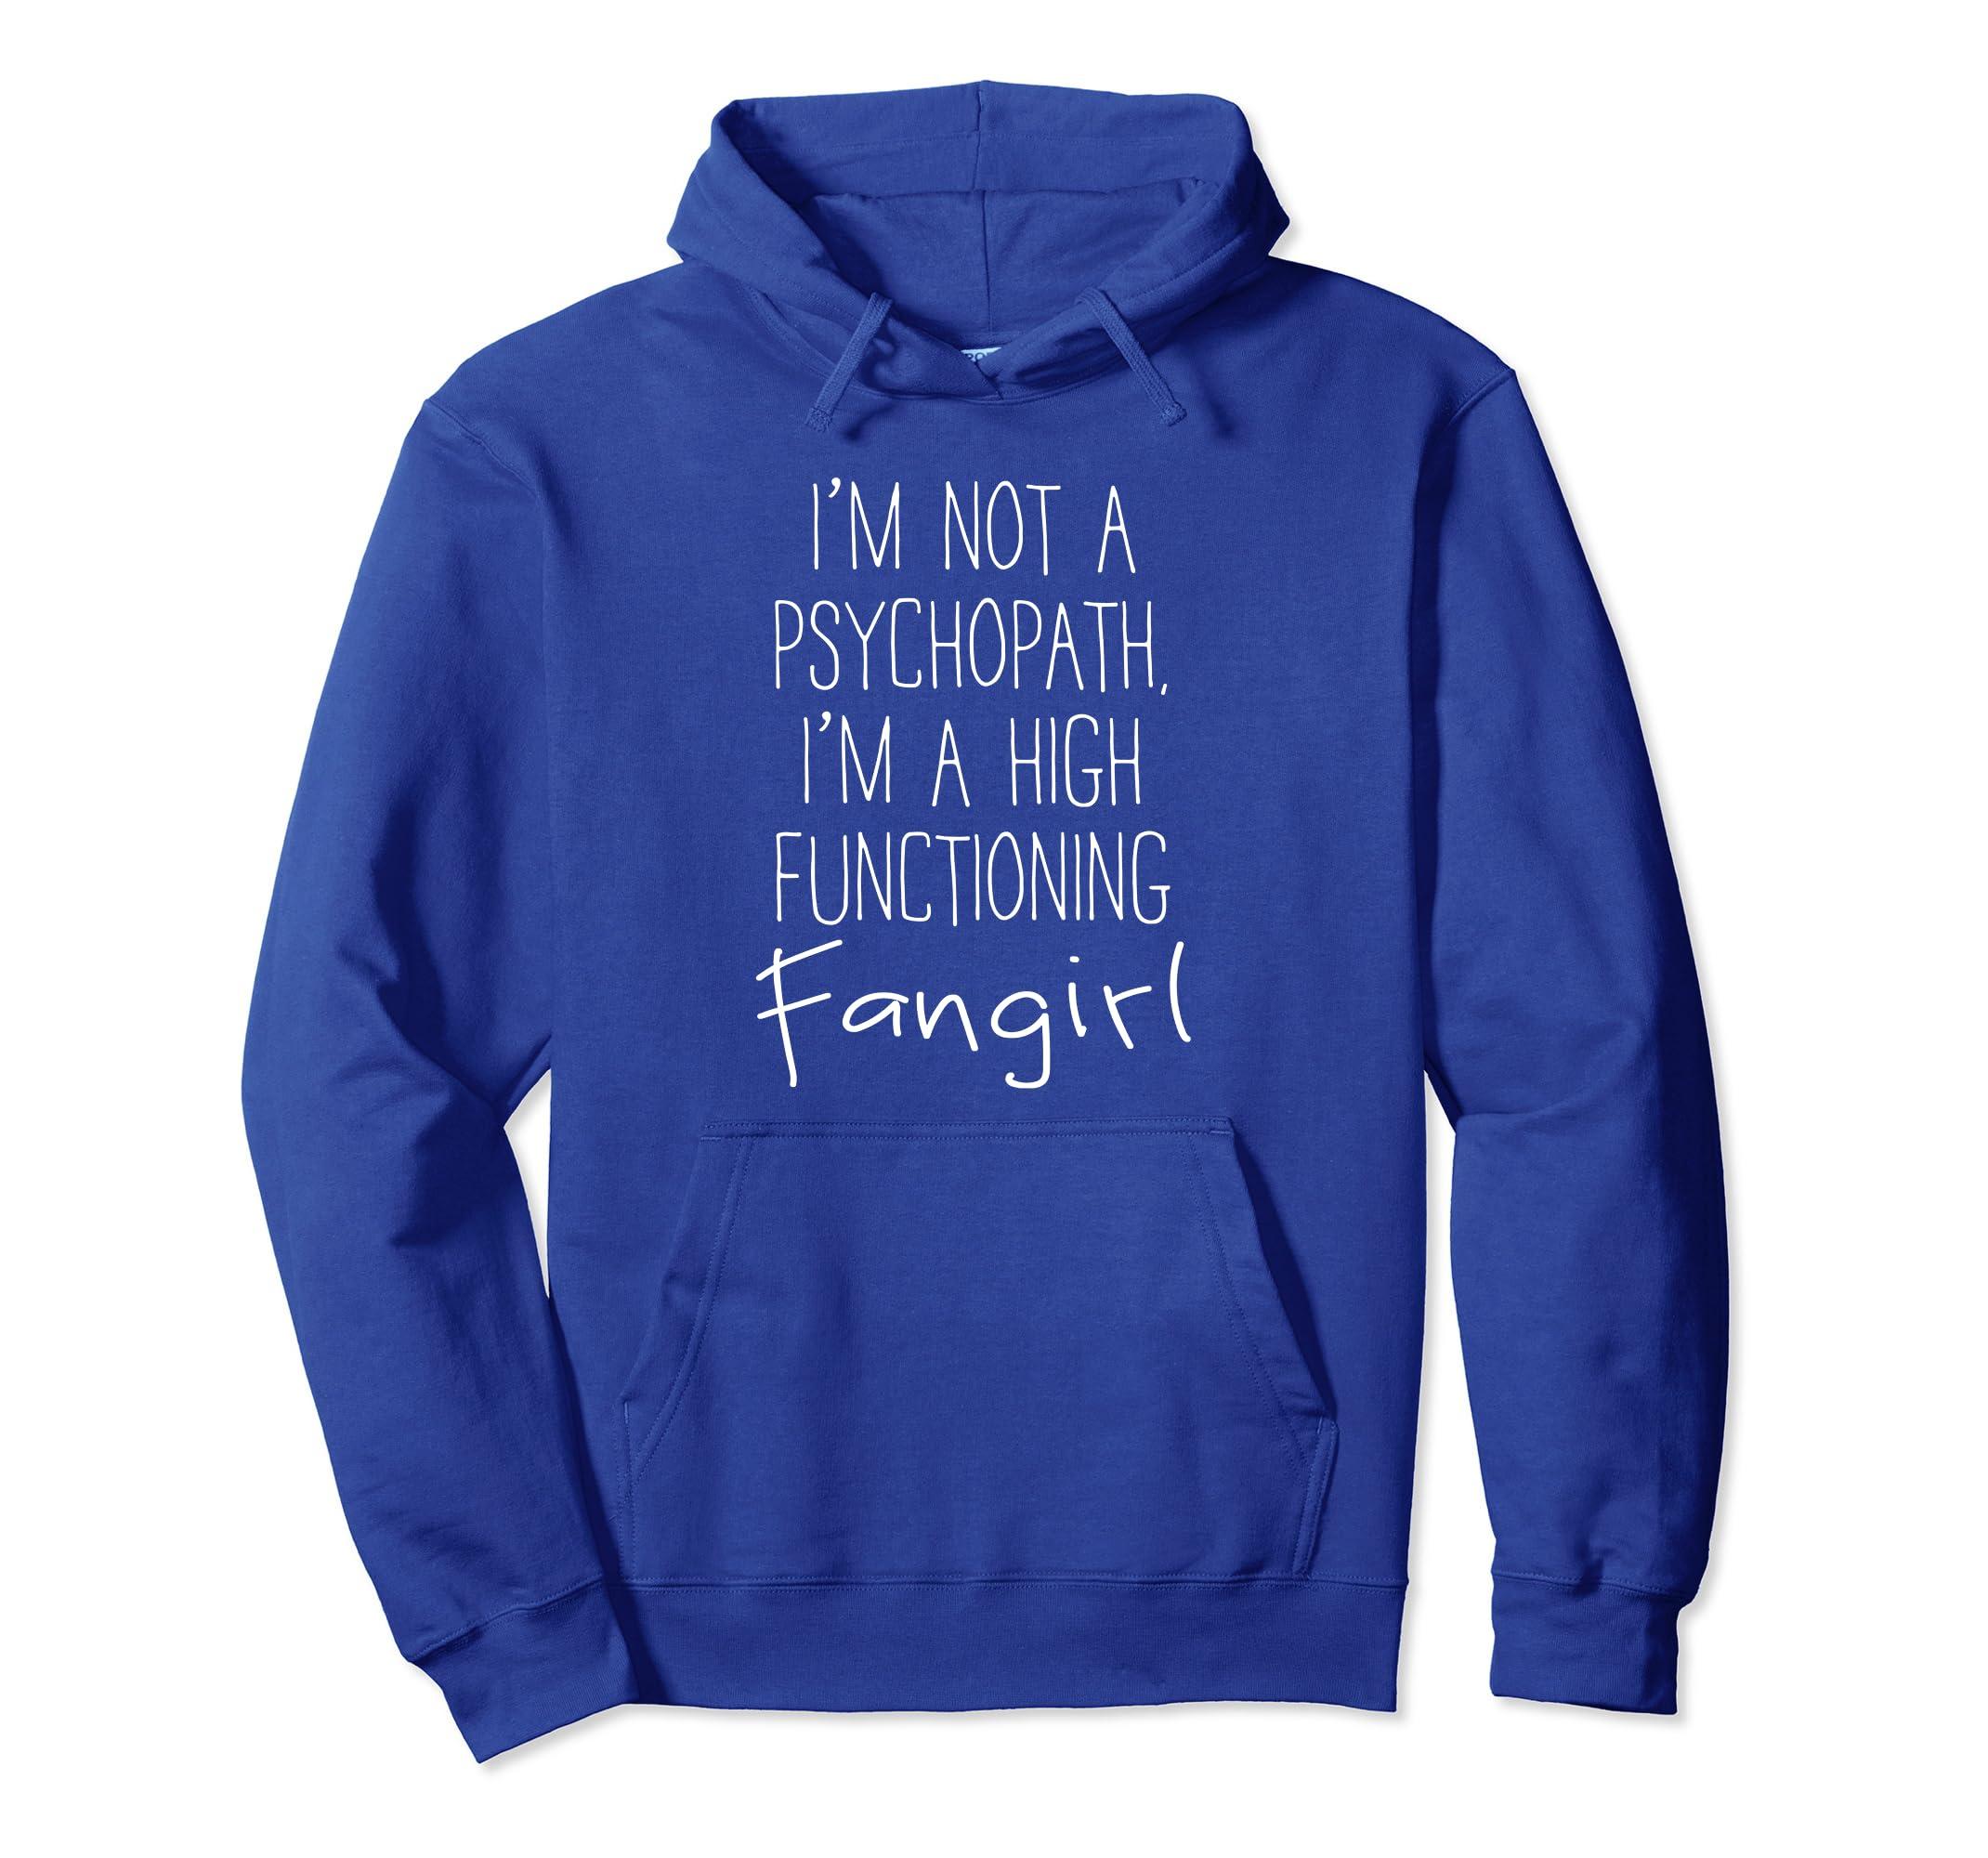 8ebc193fe Amazon.com: I'm a High-Functioning Fangirl Shirt - Sherlock - Hoodie:  Clothing